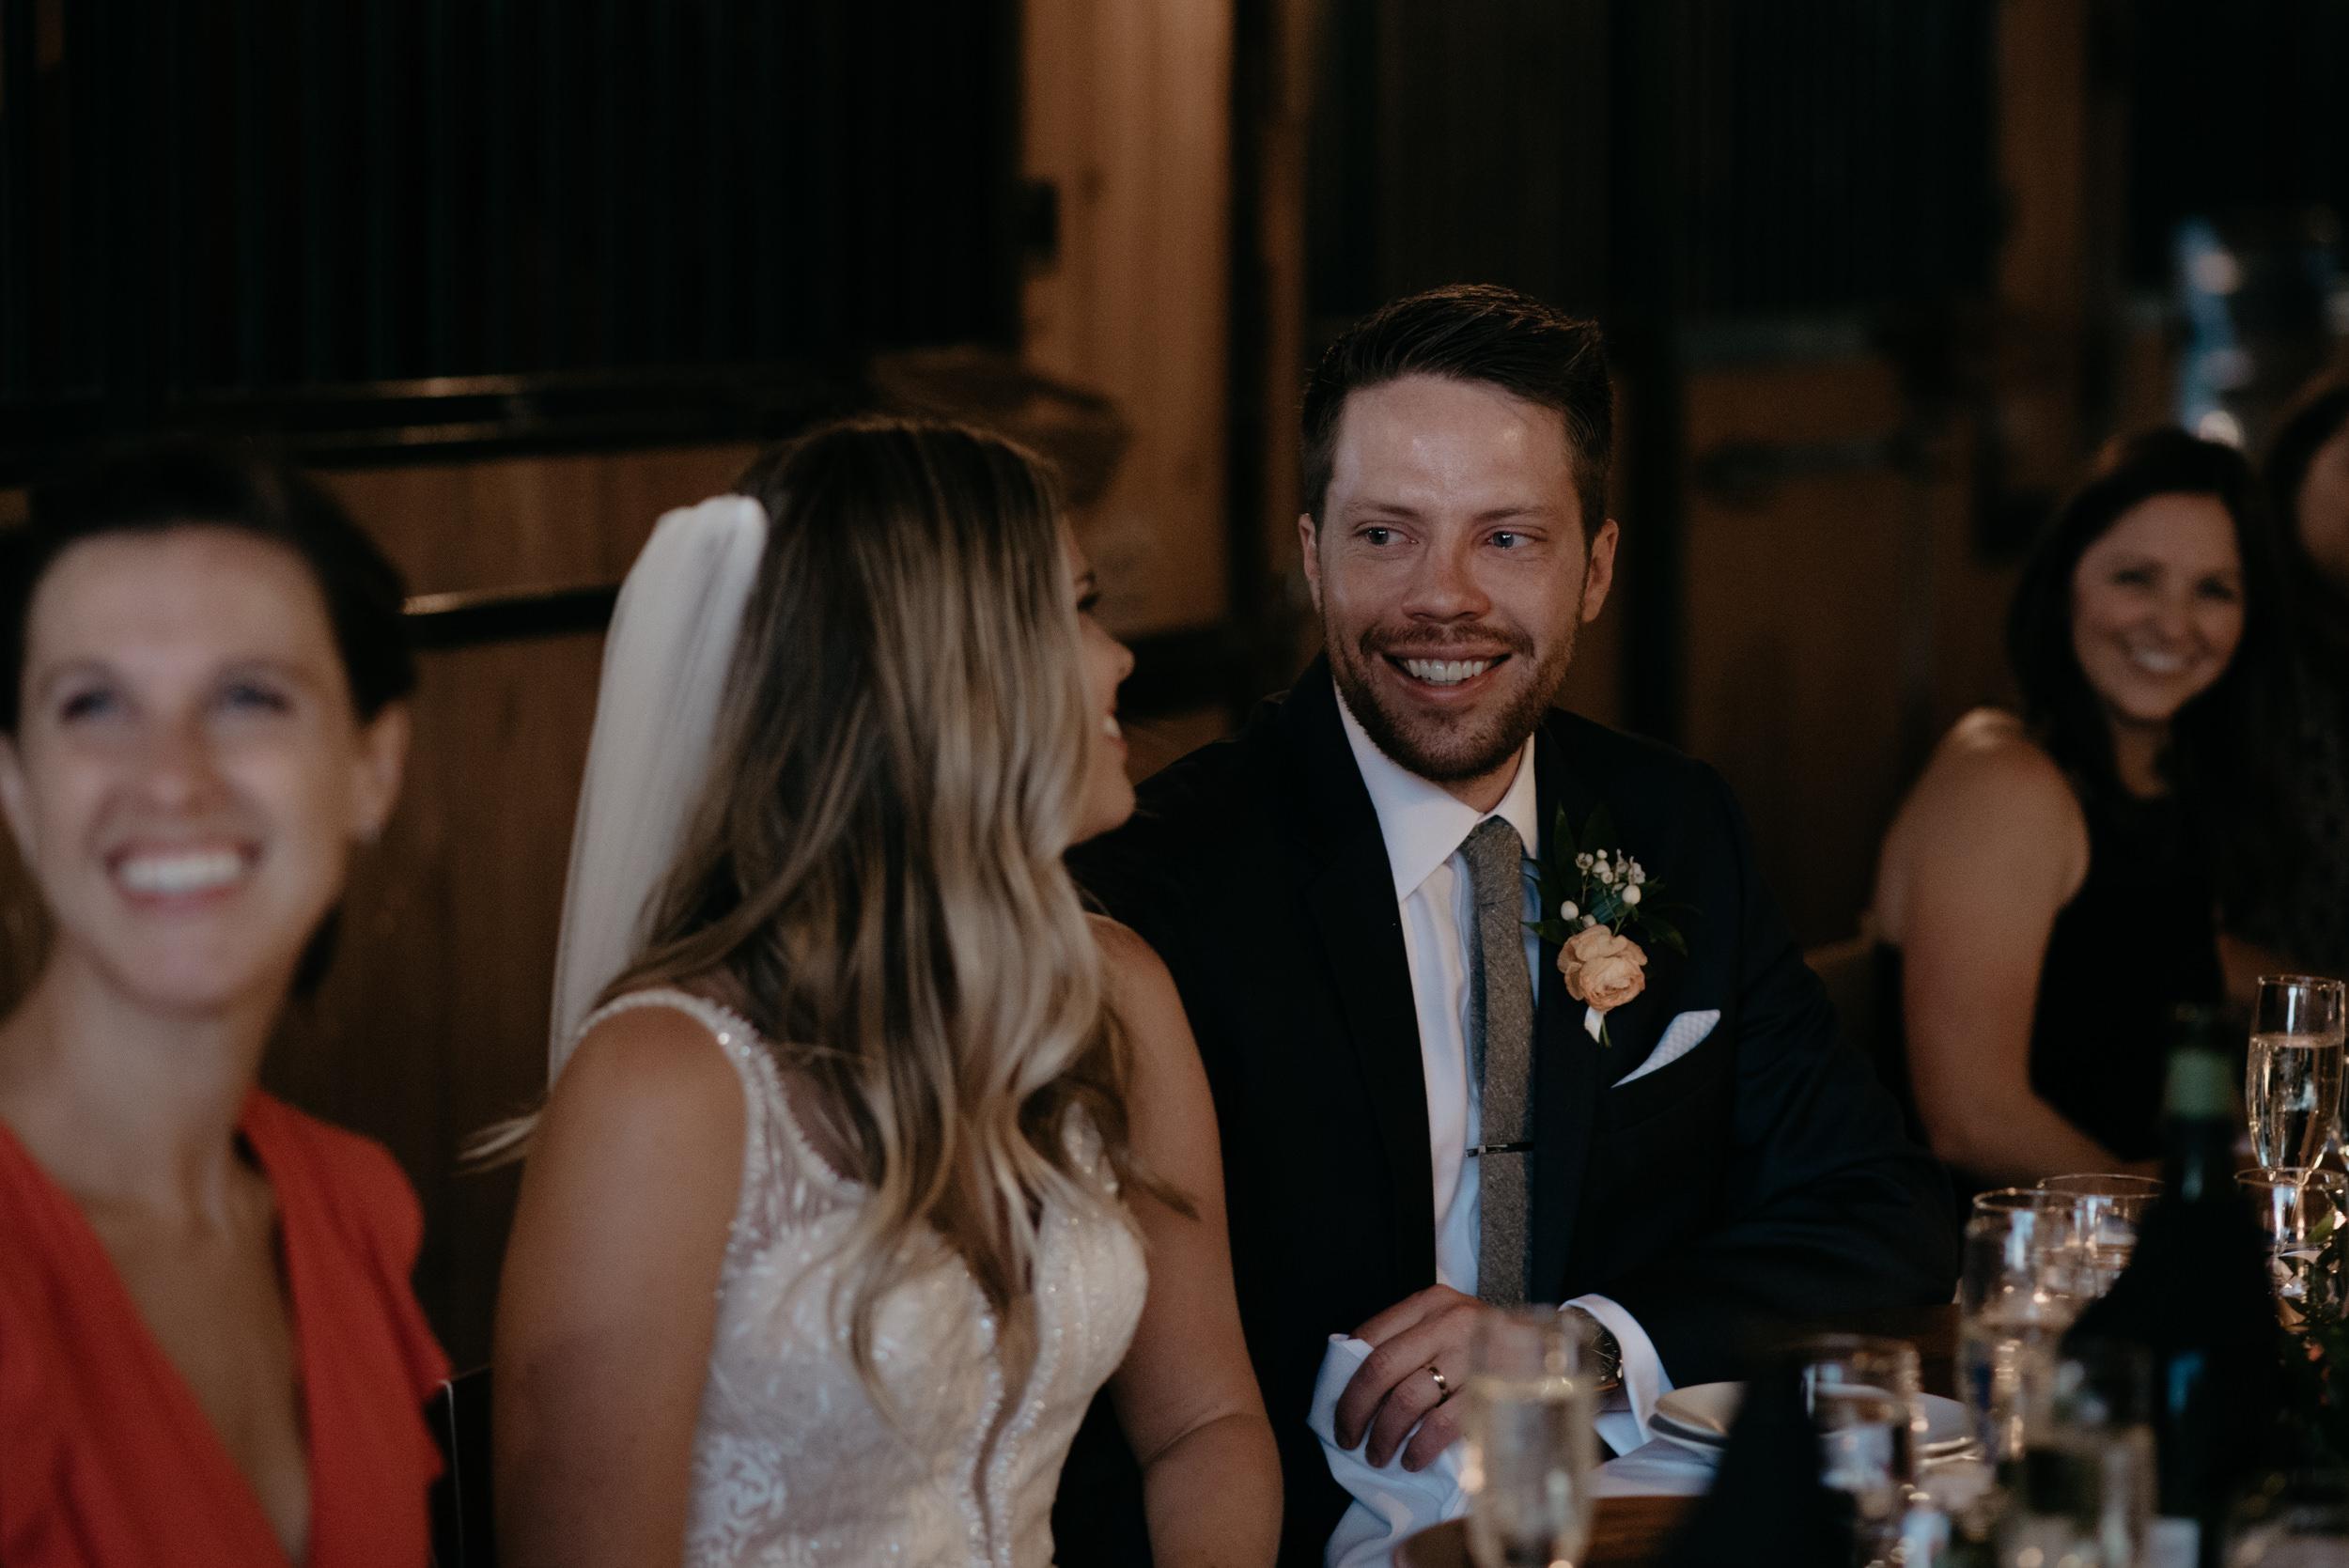 Denver and Boulder elopement and wedding photographer. Colorado adventure wedding photos.